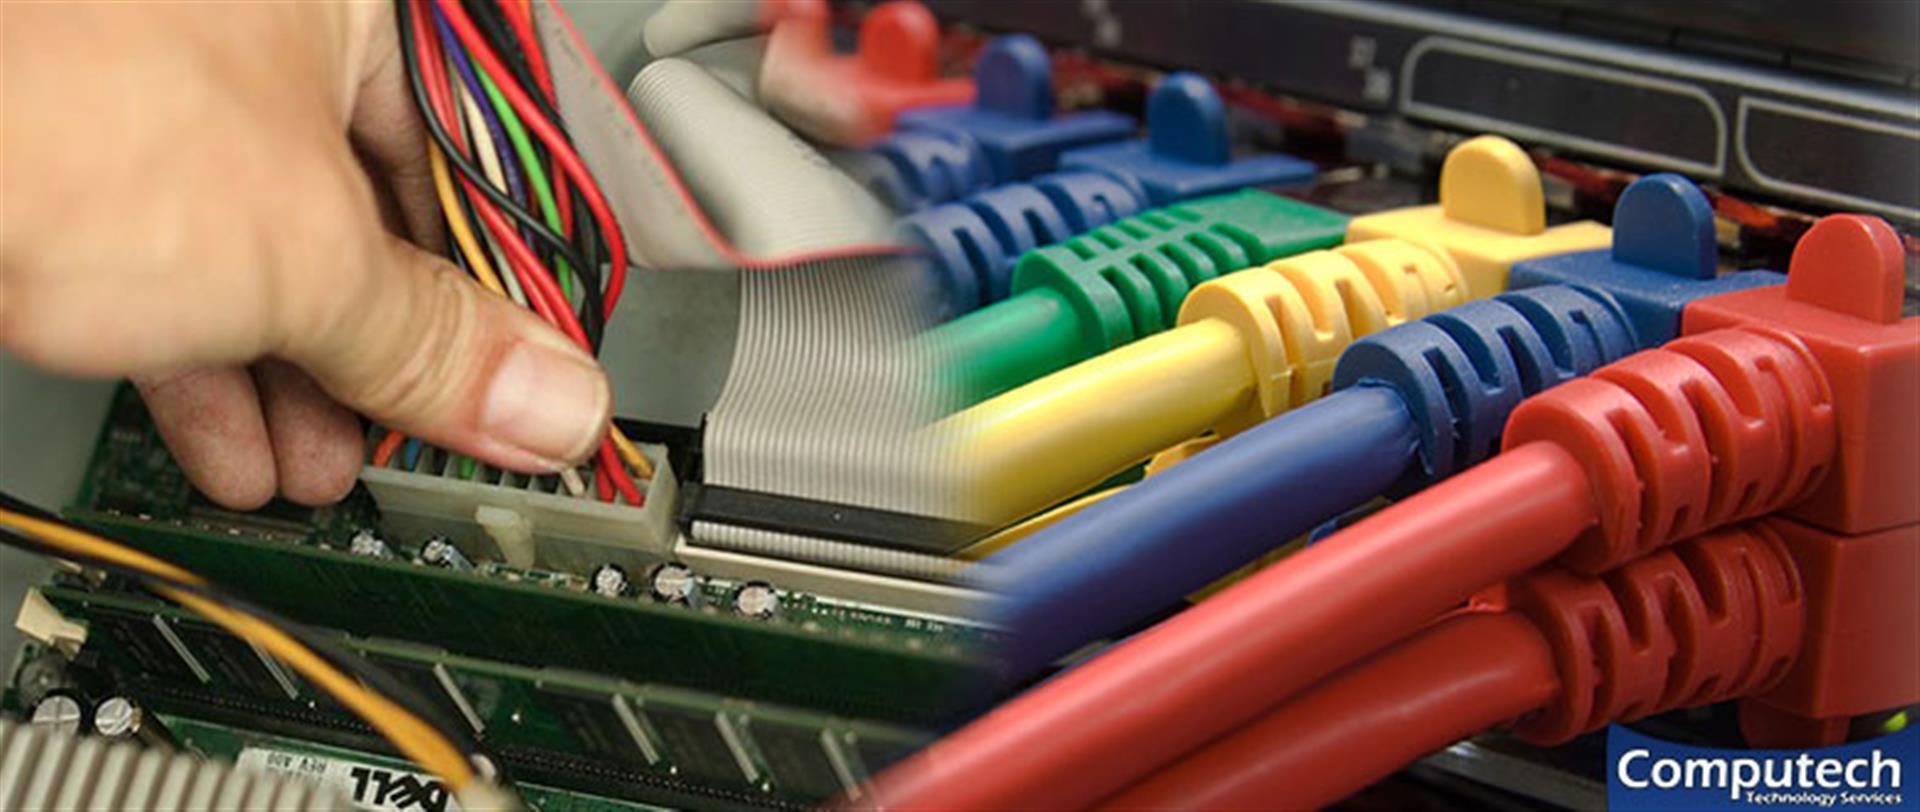 Gila Bend Arizona Onsite Computer & Printer Repairs, Network, Telecom Voice and Broadband Data Inside Wiring Solutions